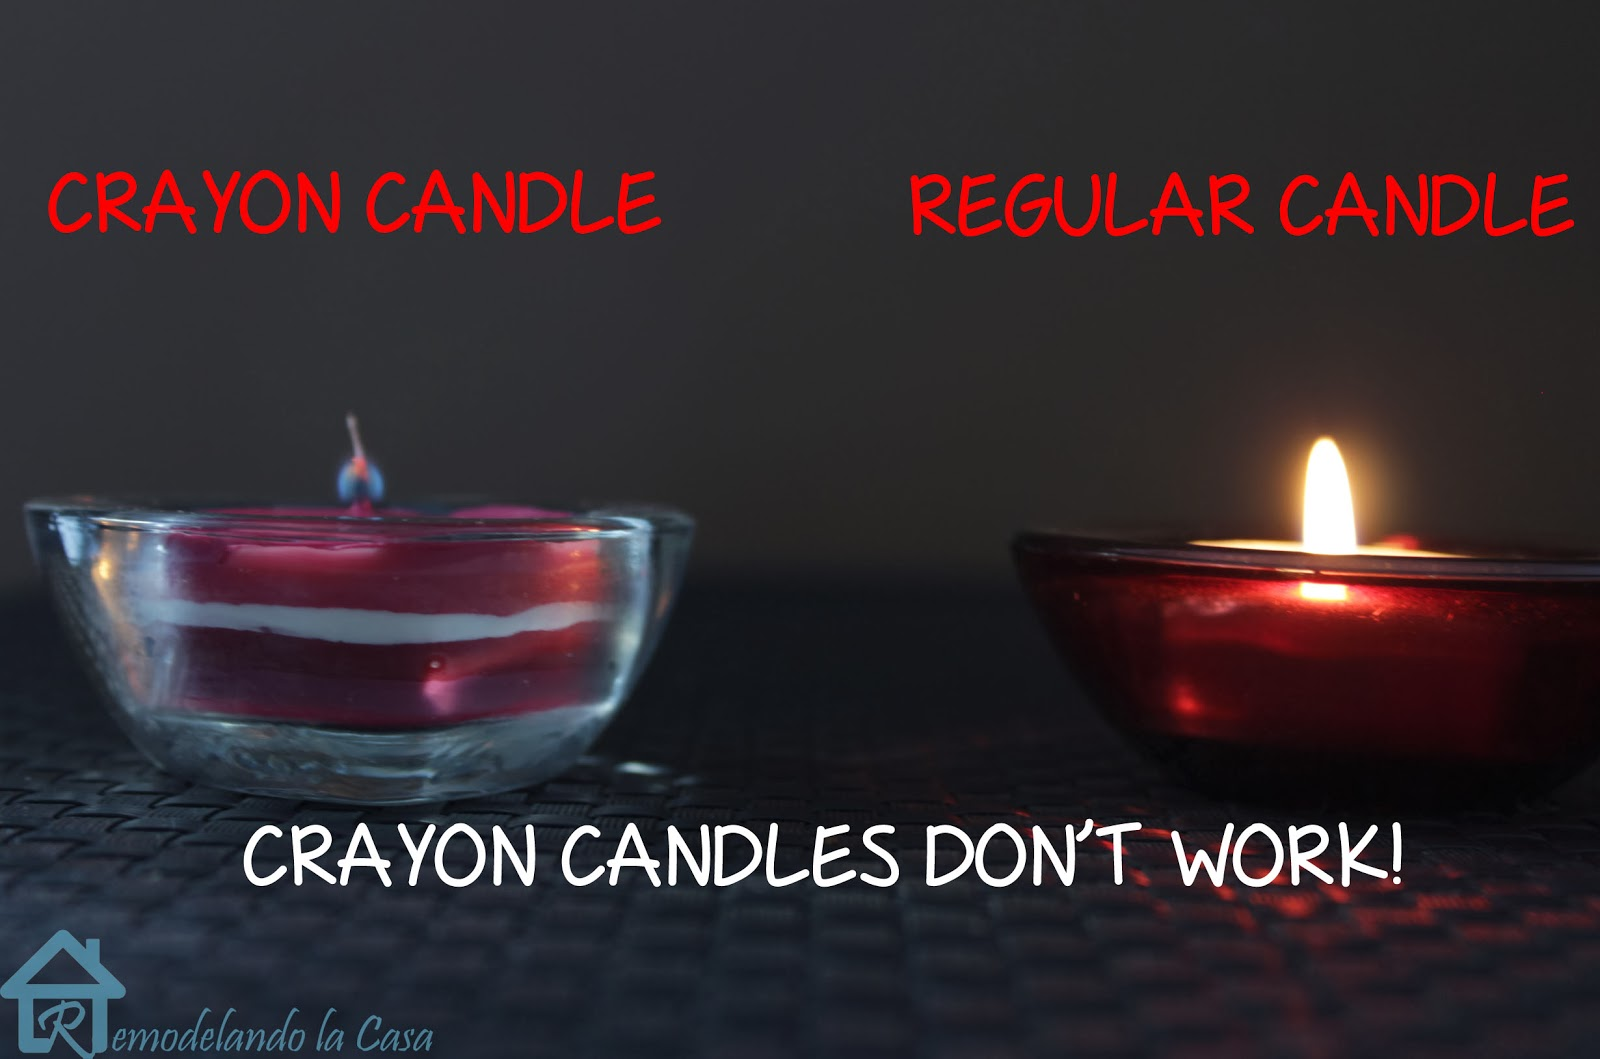 Remodelando la Casa: Crayon Candles. A pretty but not a functional ...